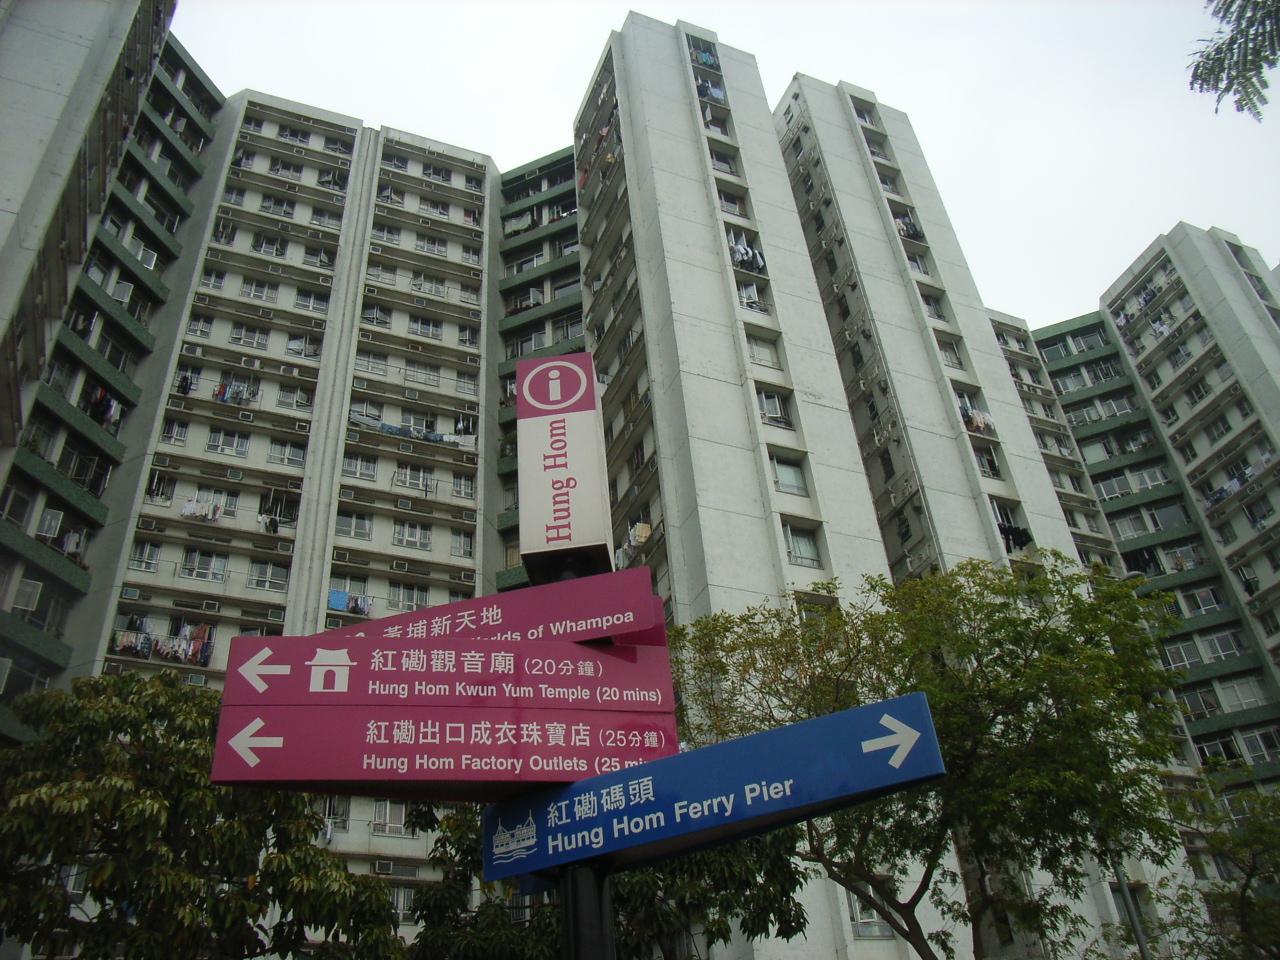 HK_Whampoa_Garden_Lily_Mansions_dir.JPG